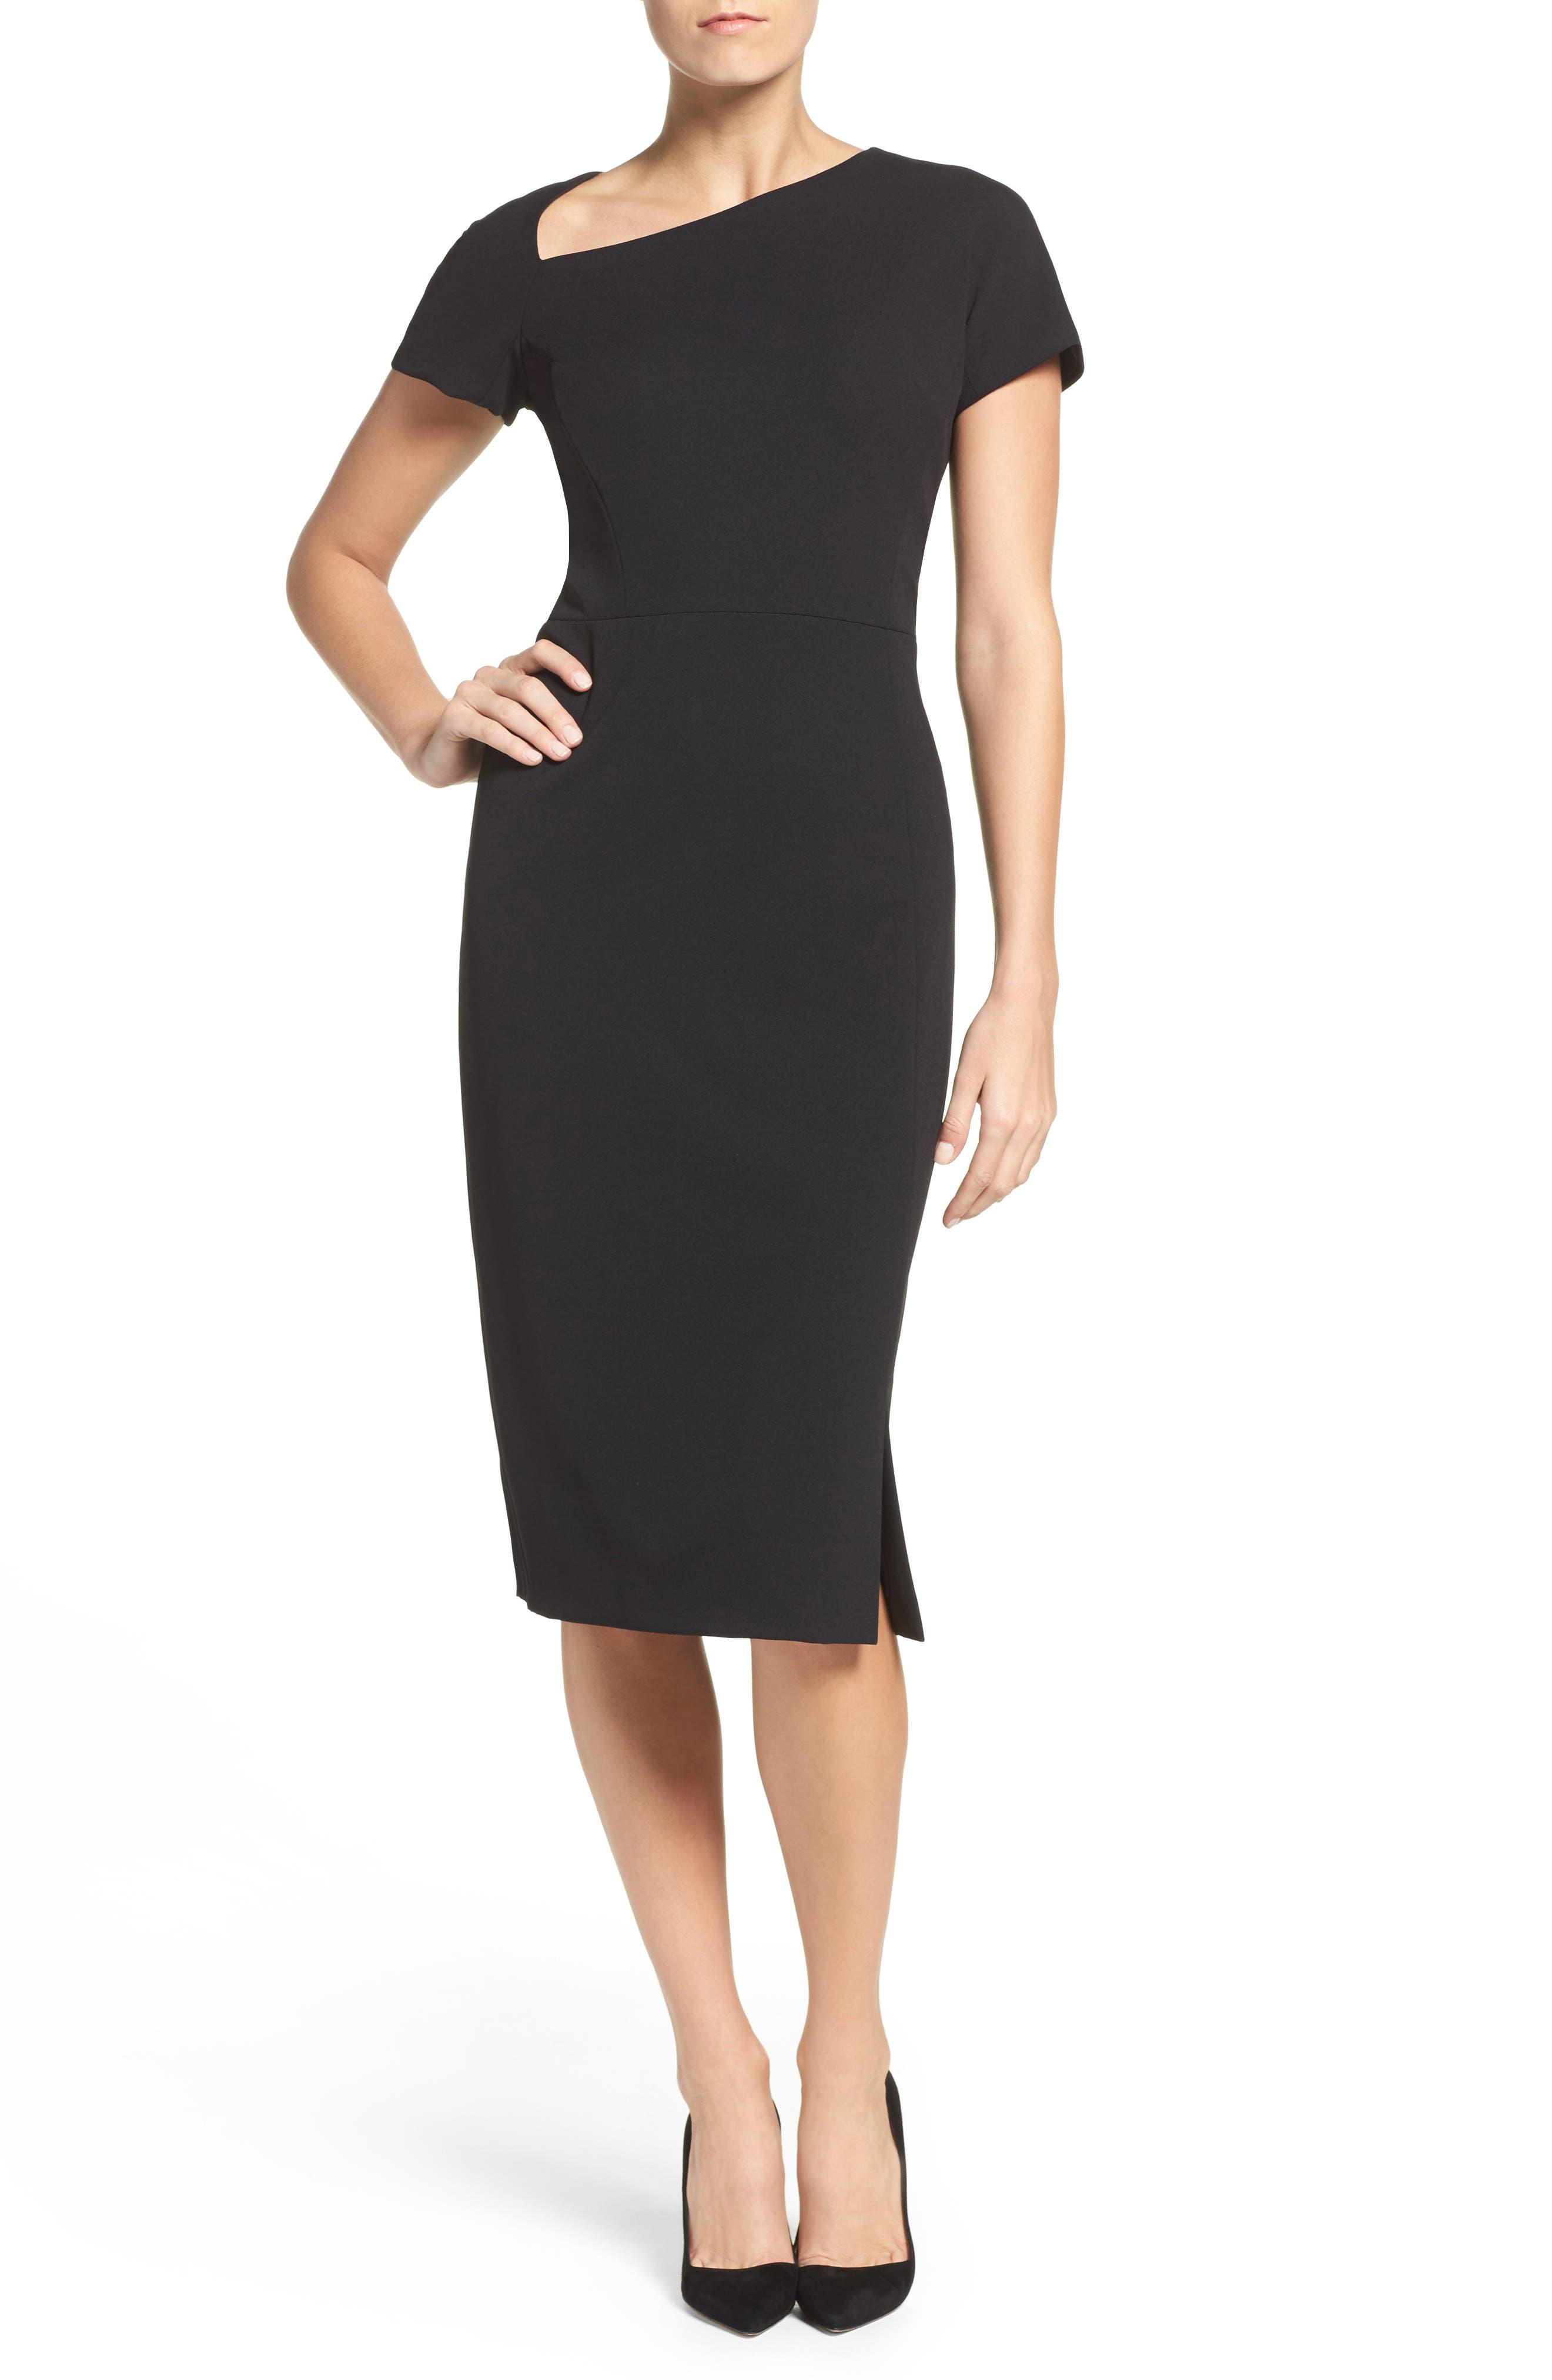 MAGGY LONDON, Asymmetrical Sheath Dress, Main thumbnail 1, color, 001